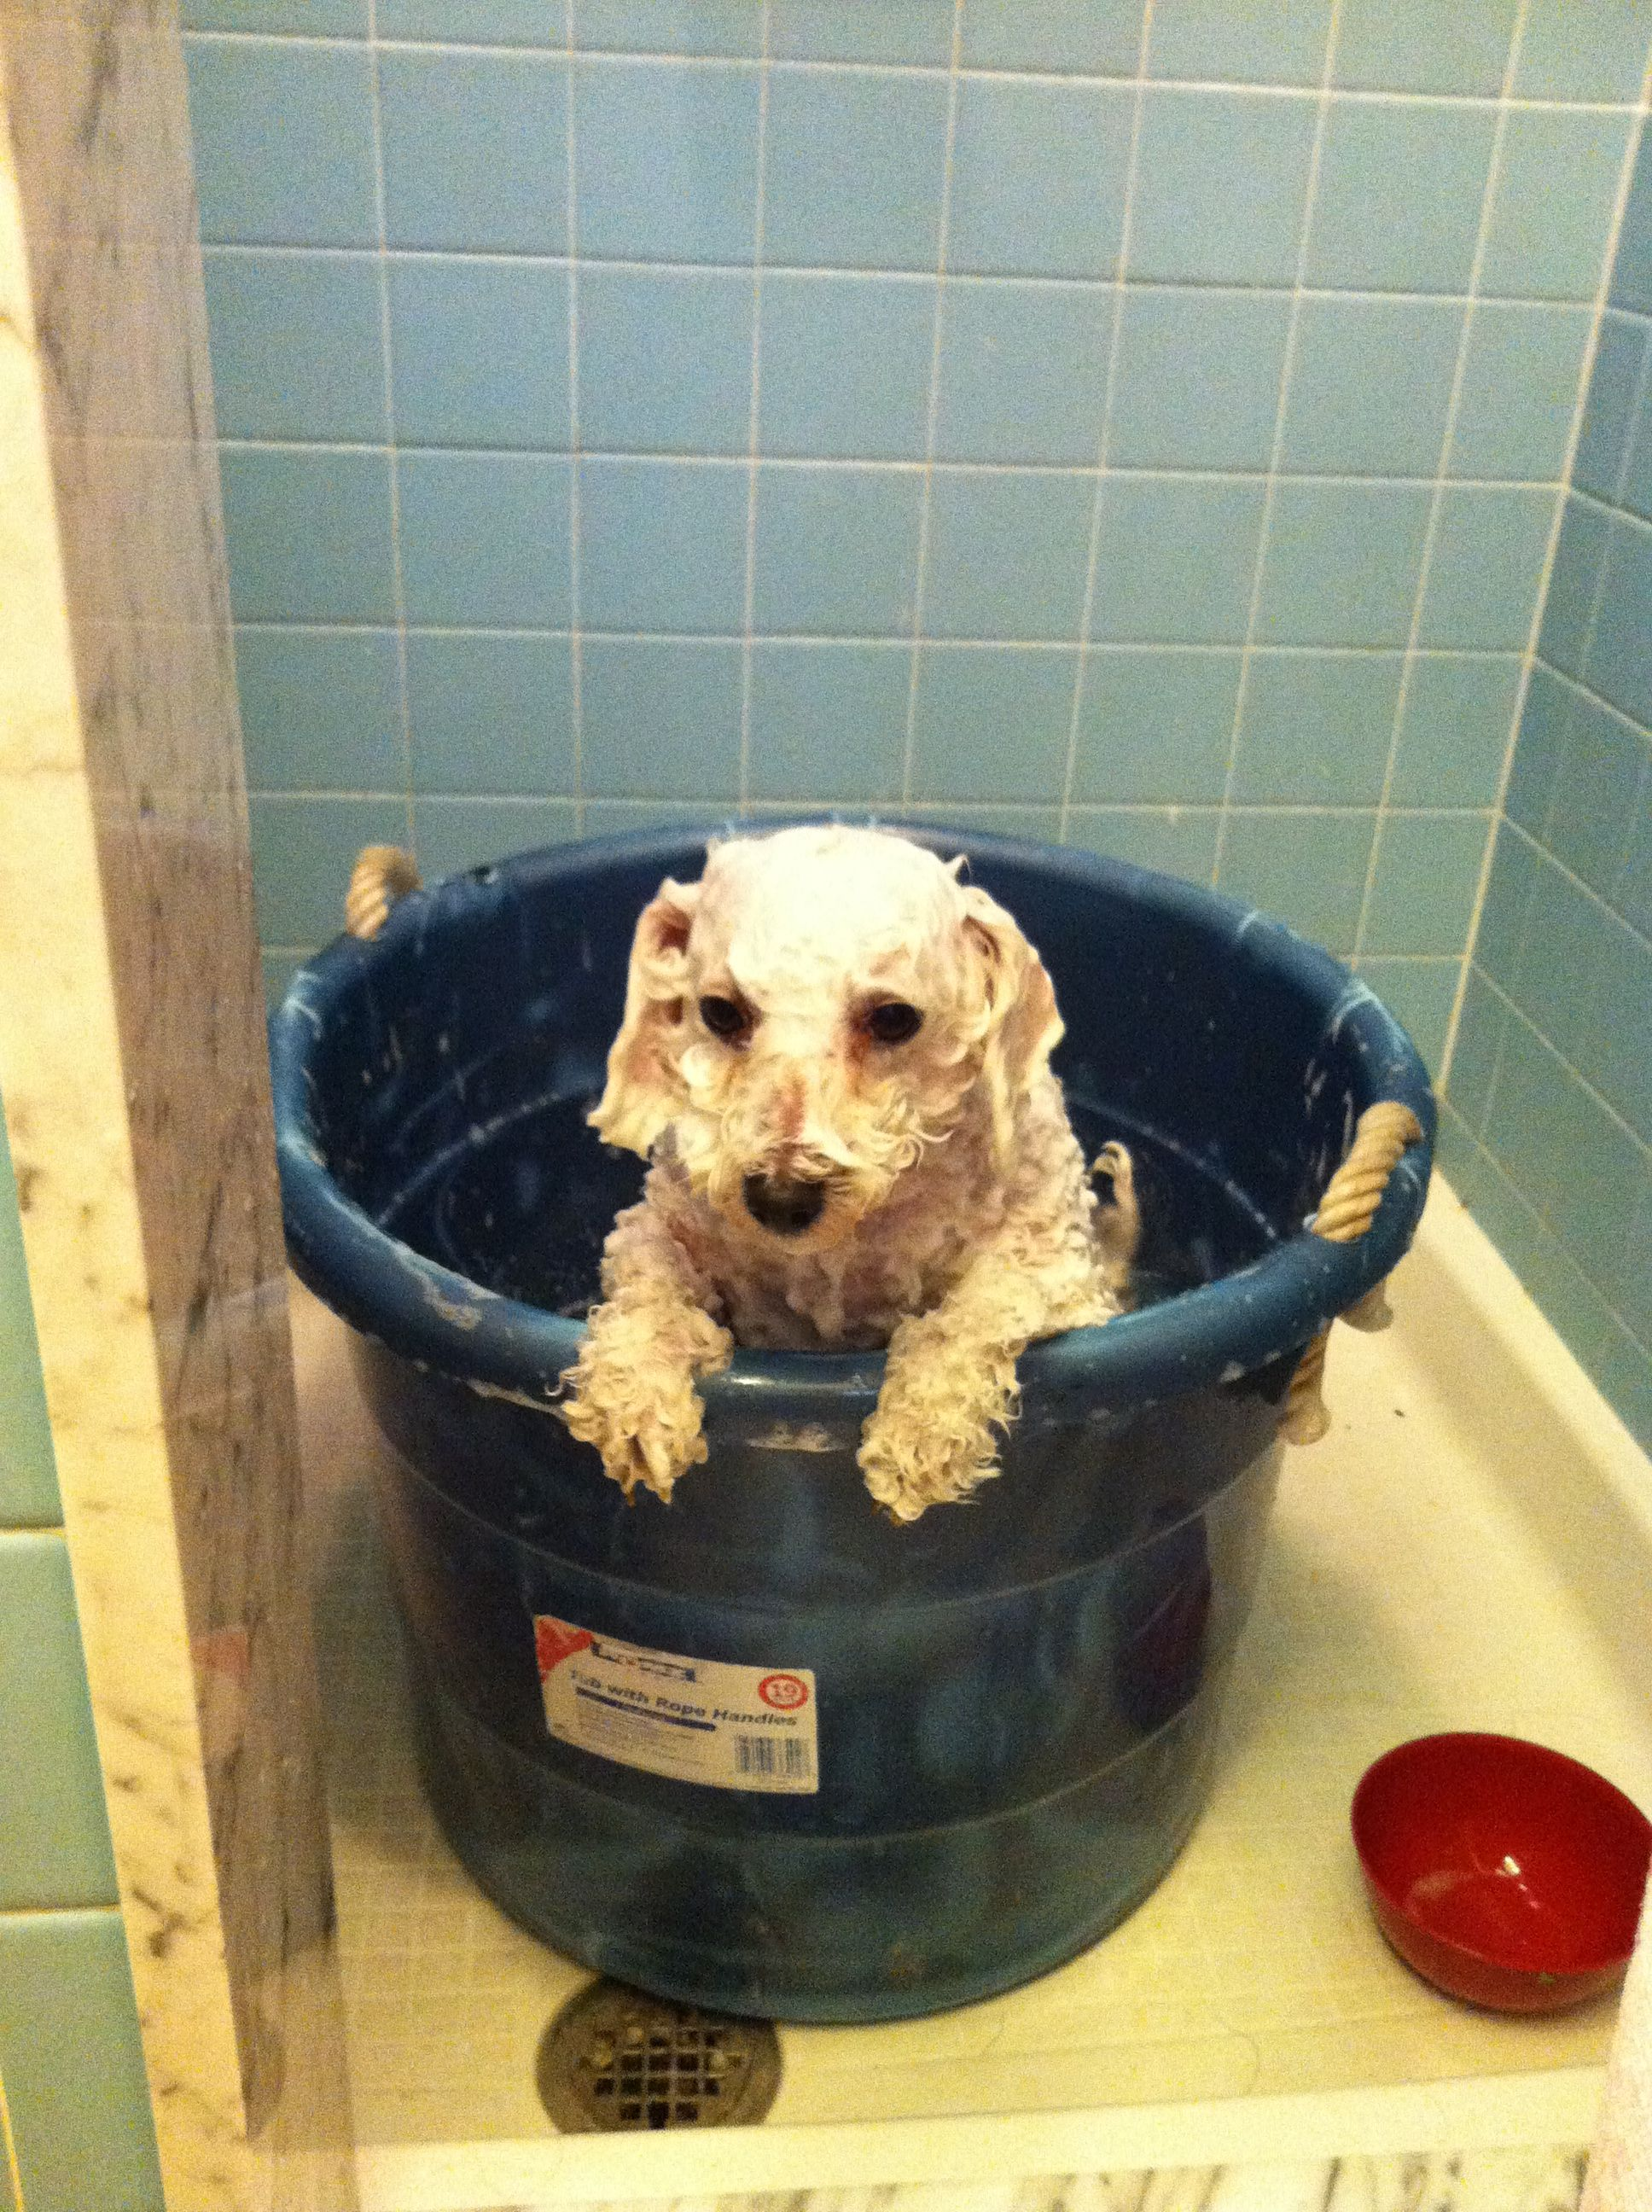 Wet dog Children's book images Pinterest #752C1A